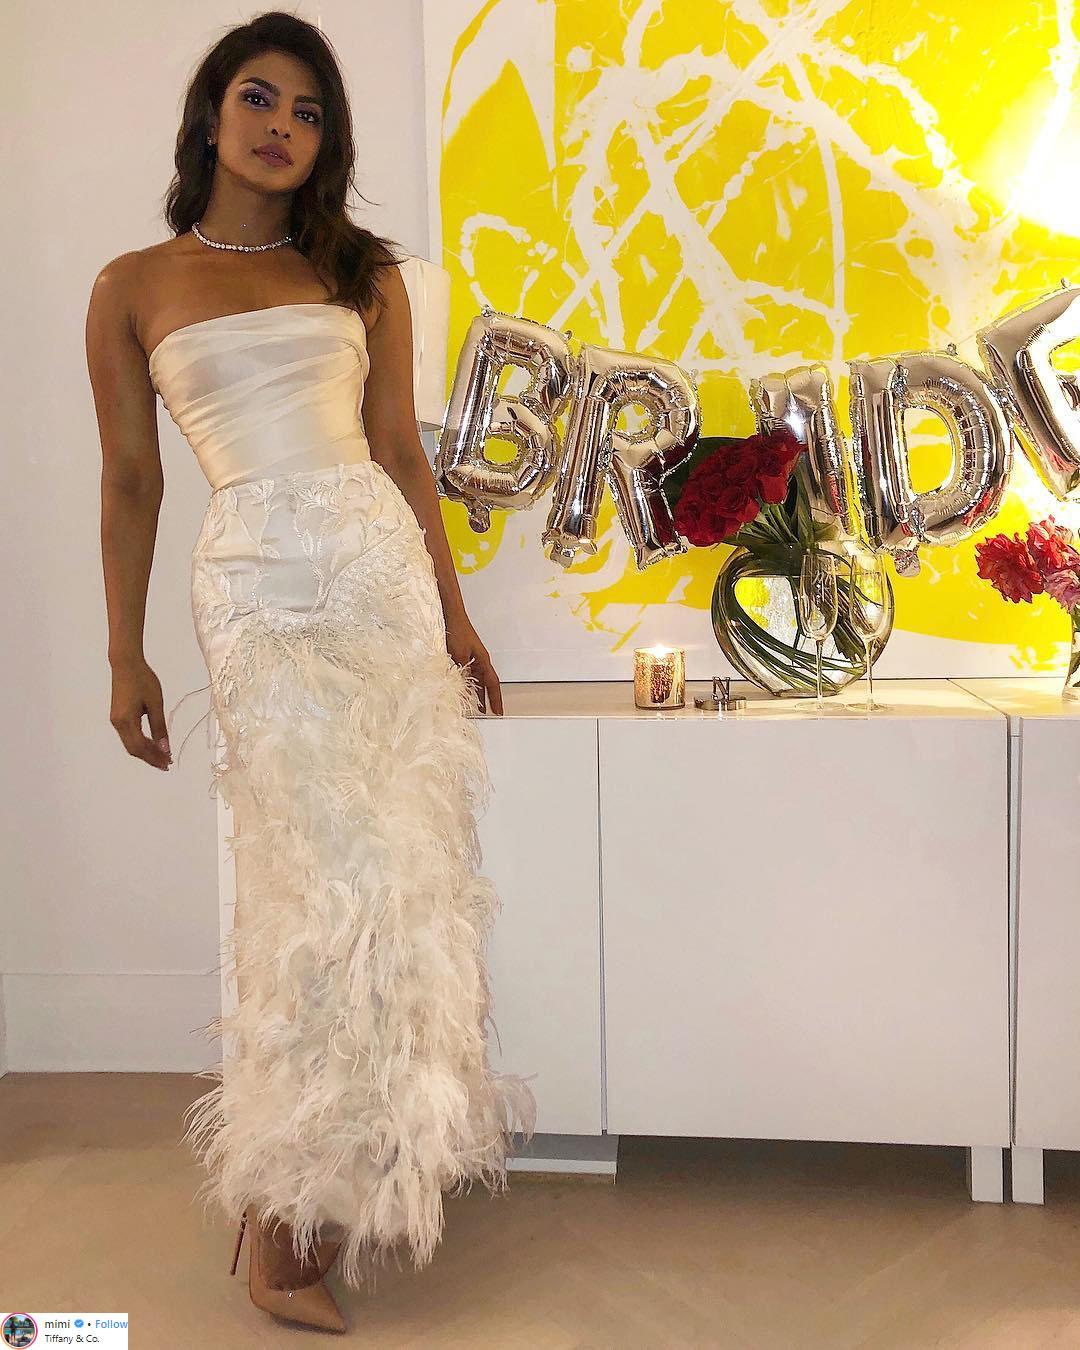 hoa hậu thế giới priyanka chopra bridal shower party 1